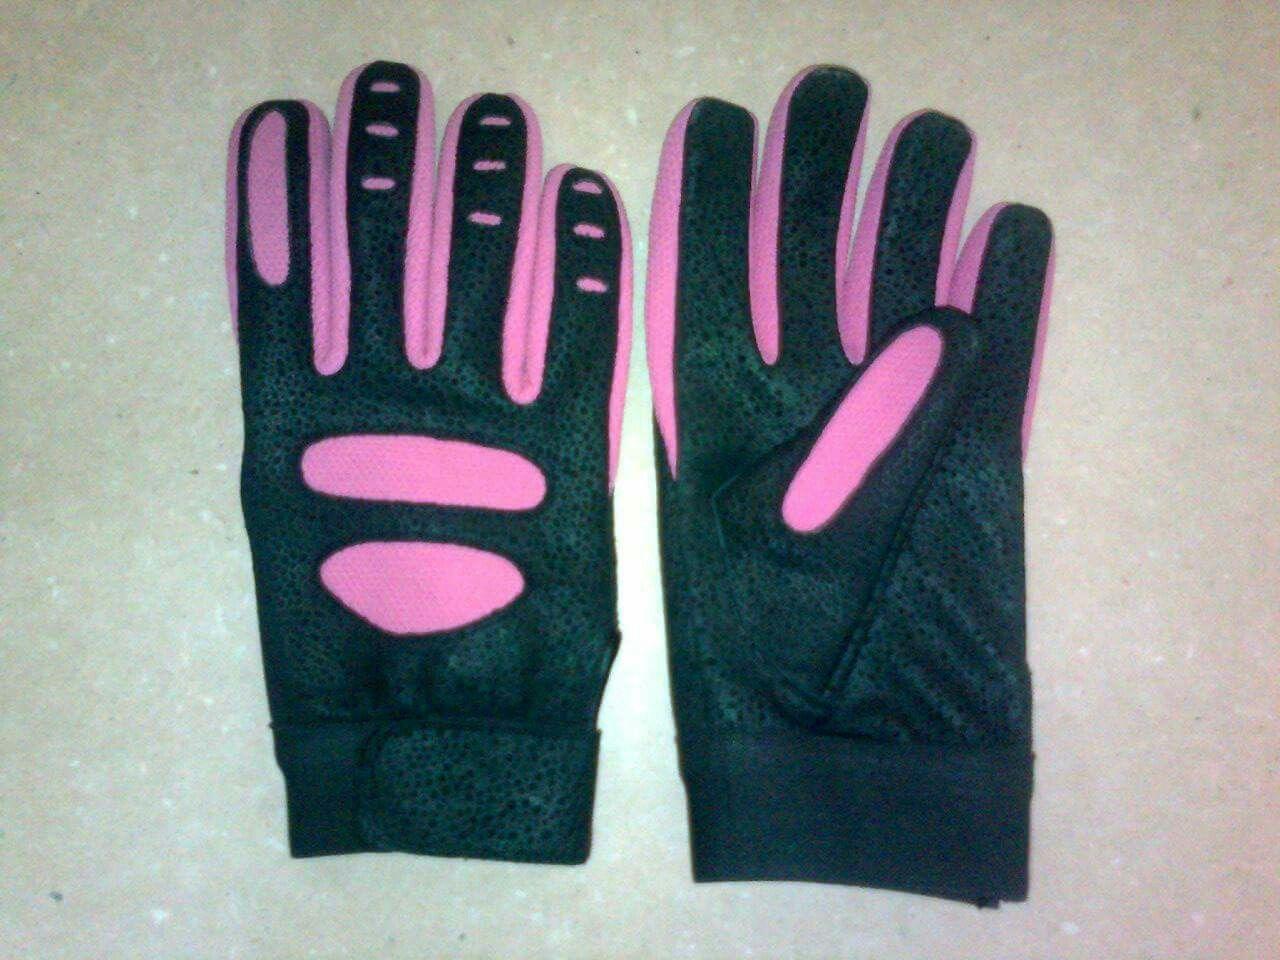 Black leather batting gloves - Standard Quality Pink And Black Colour Batting Gloves Made From Sheepskin Leather